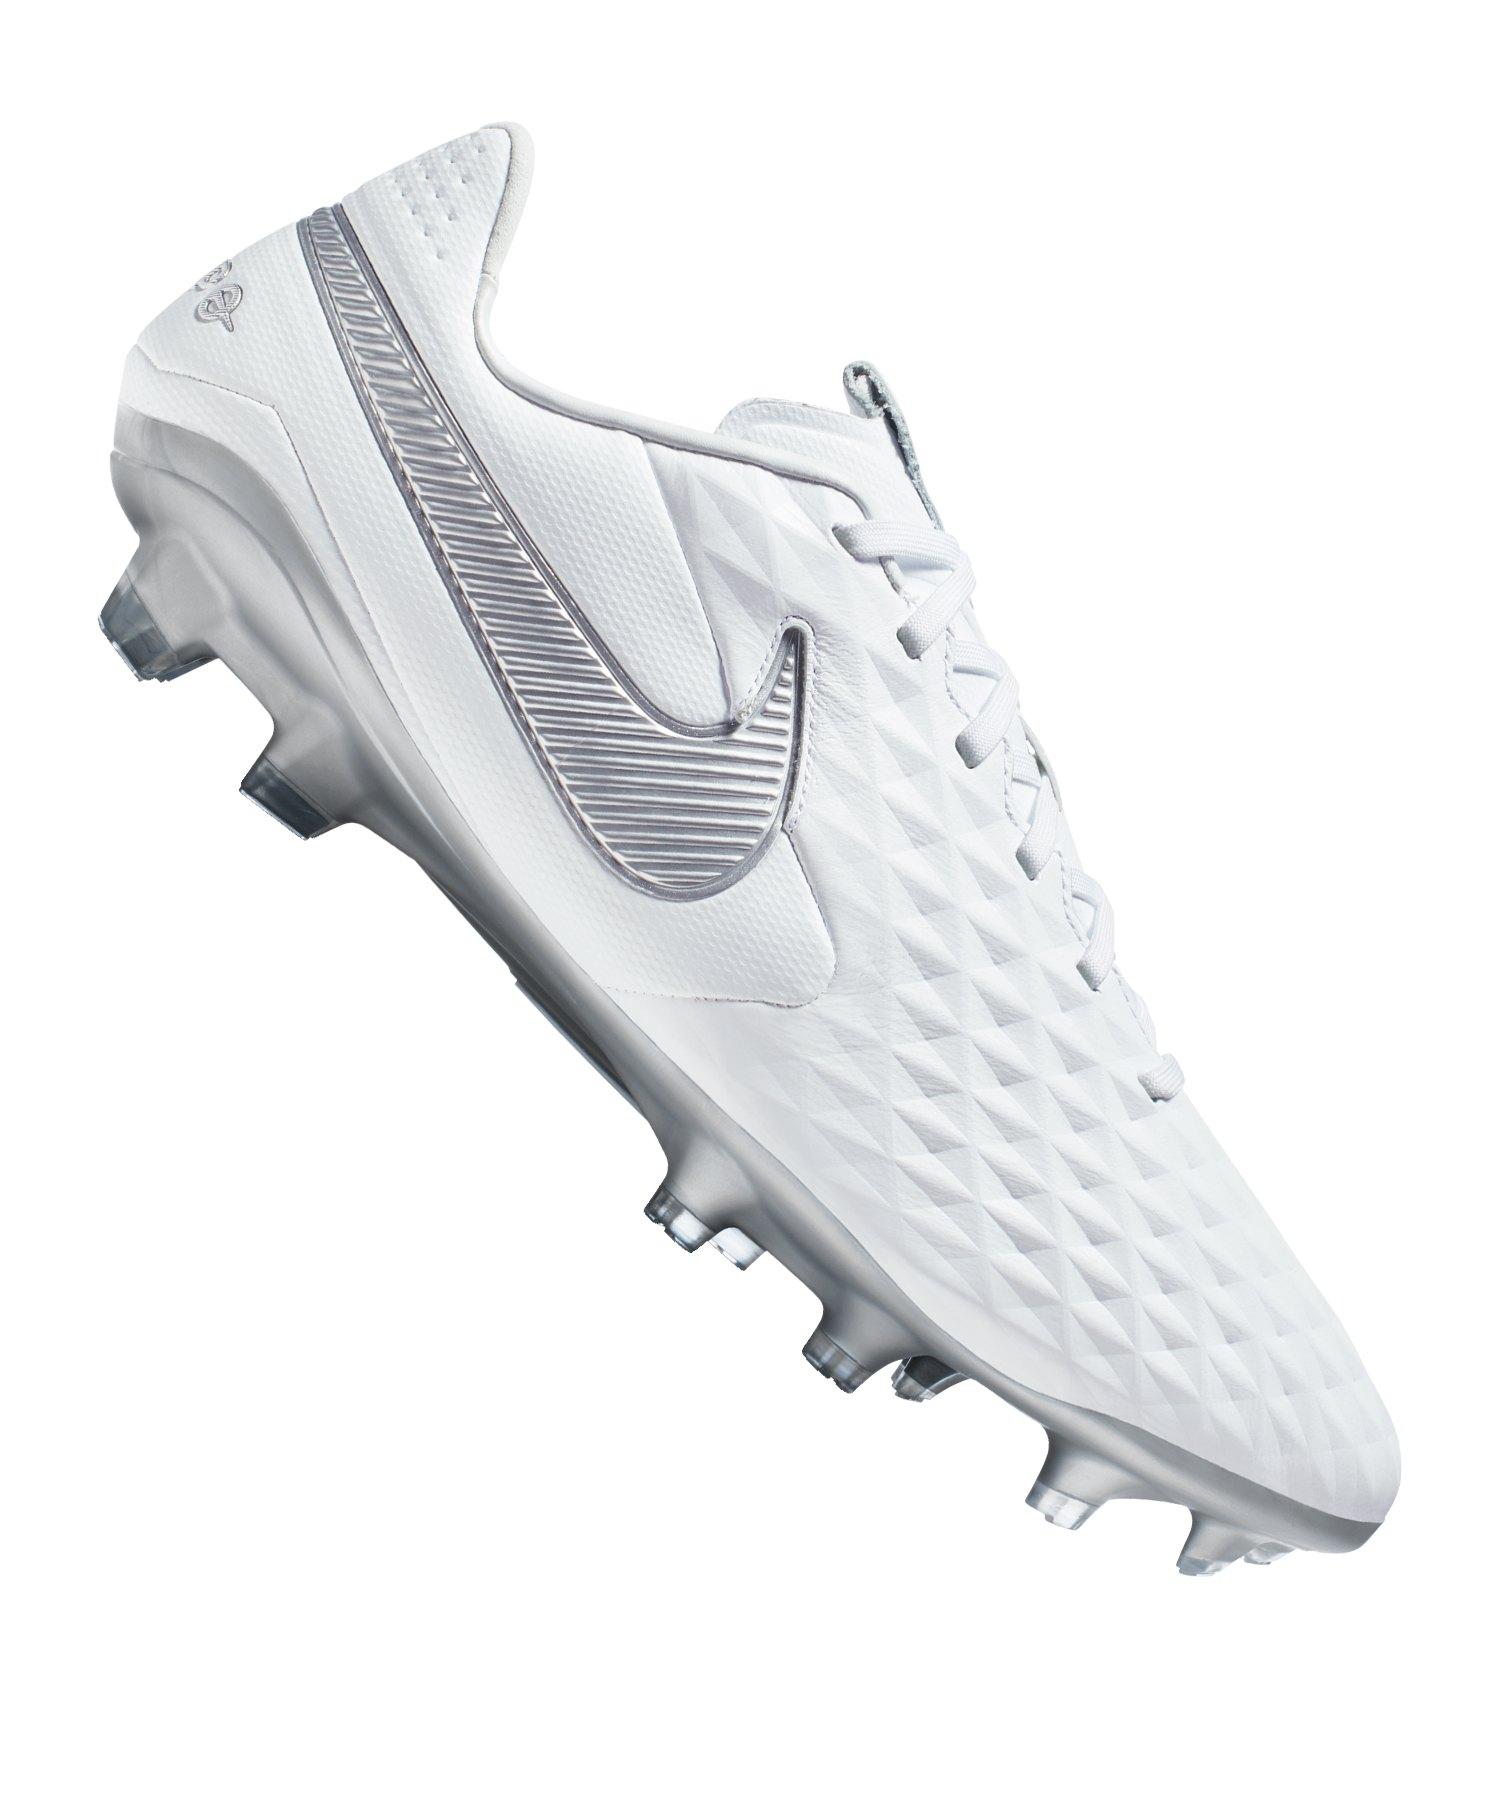 Weiss Nike Viii Pro Legend Fg Tiempo F100 dBCorxe